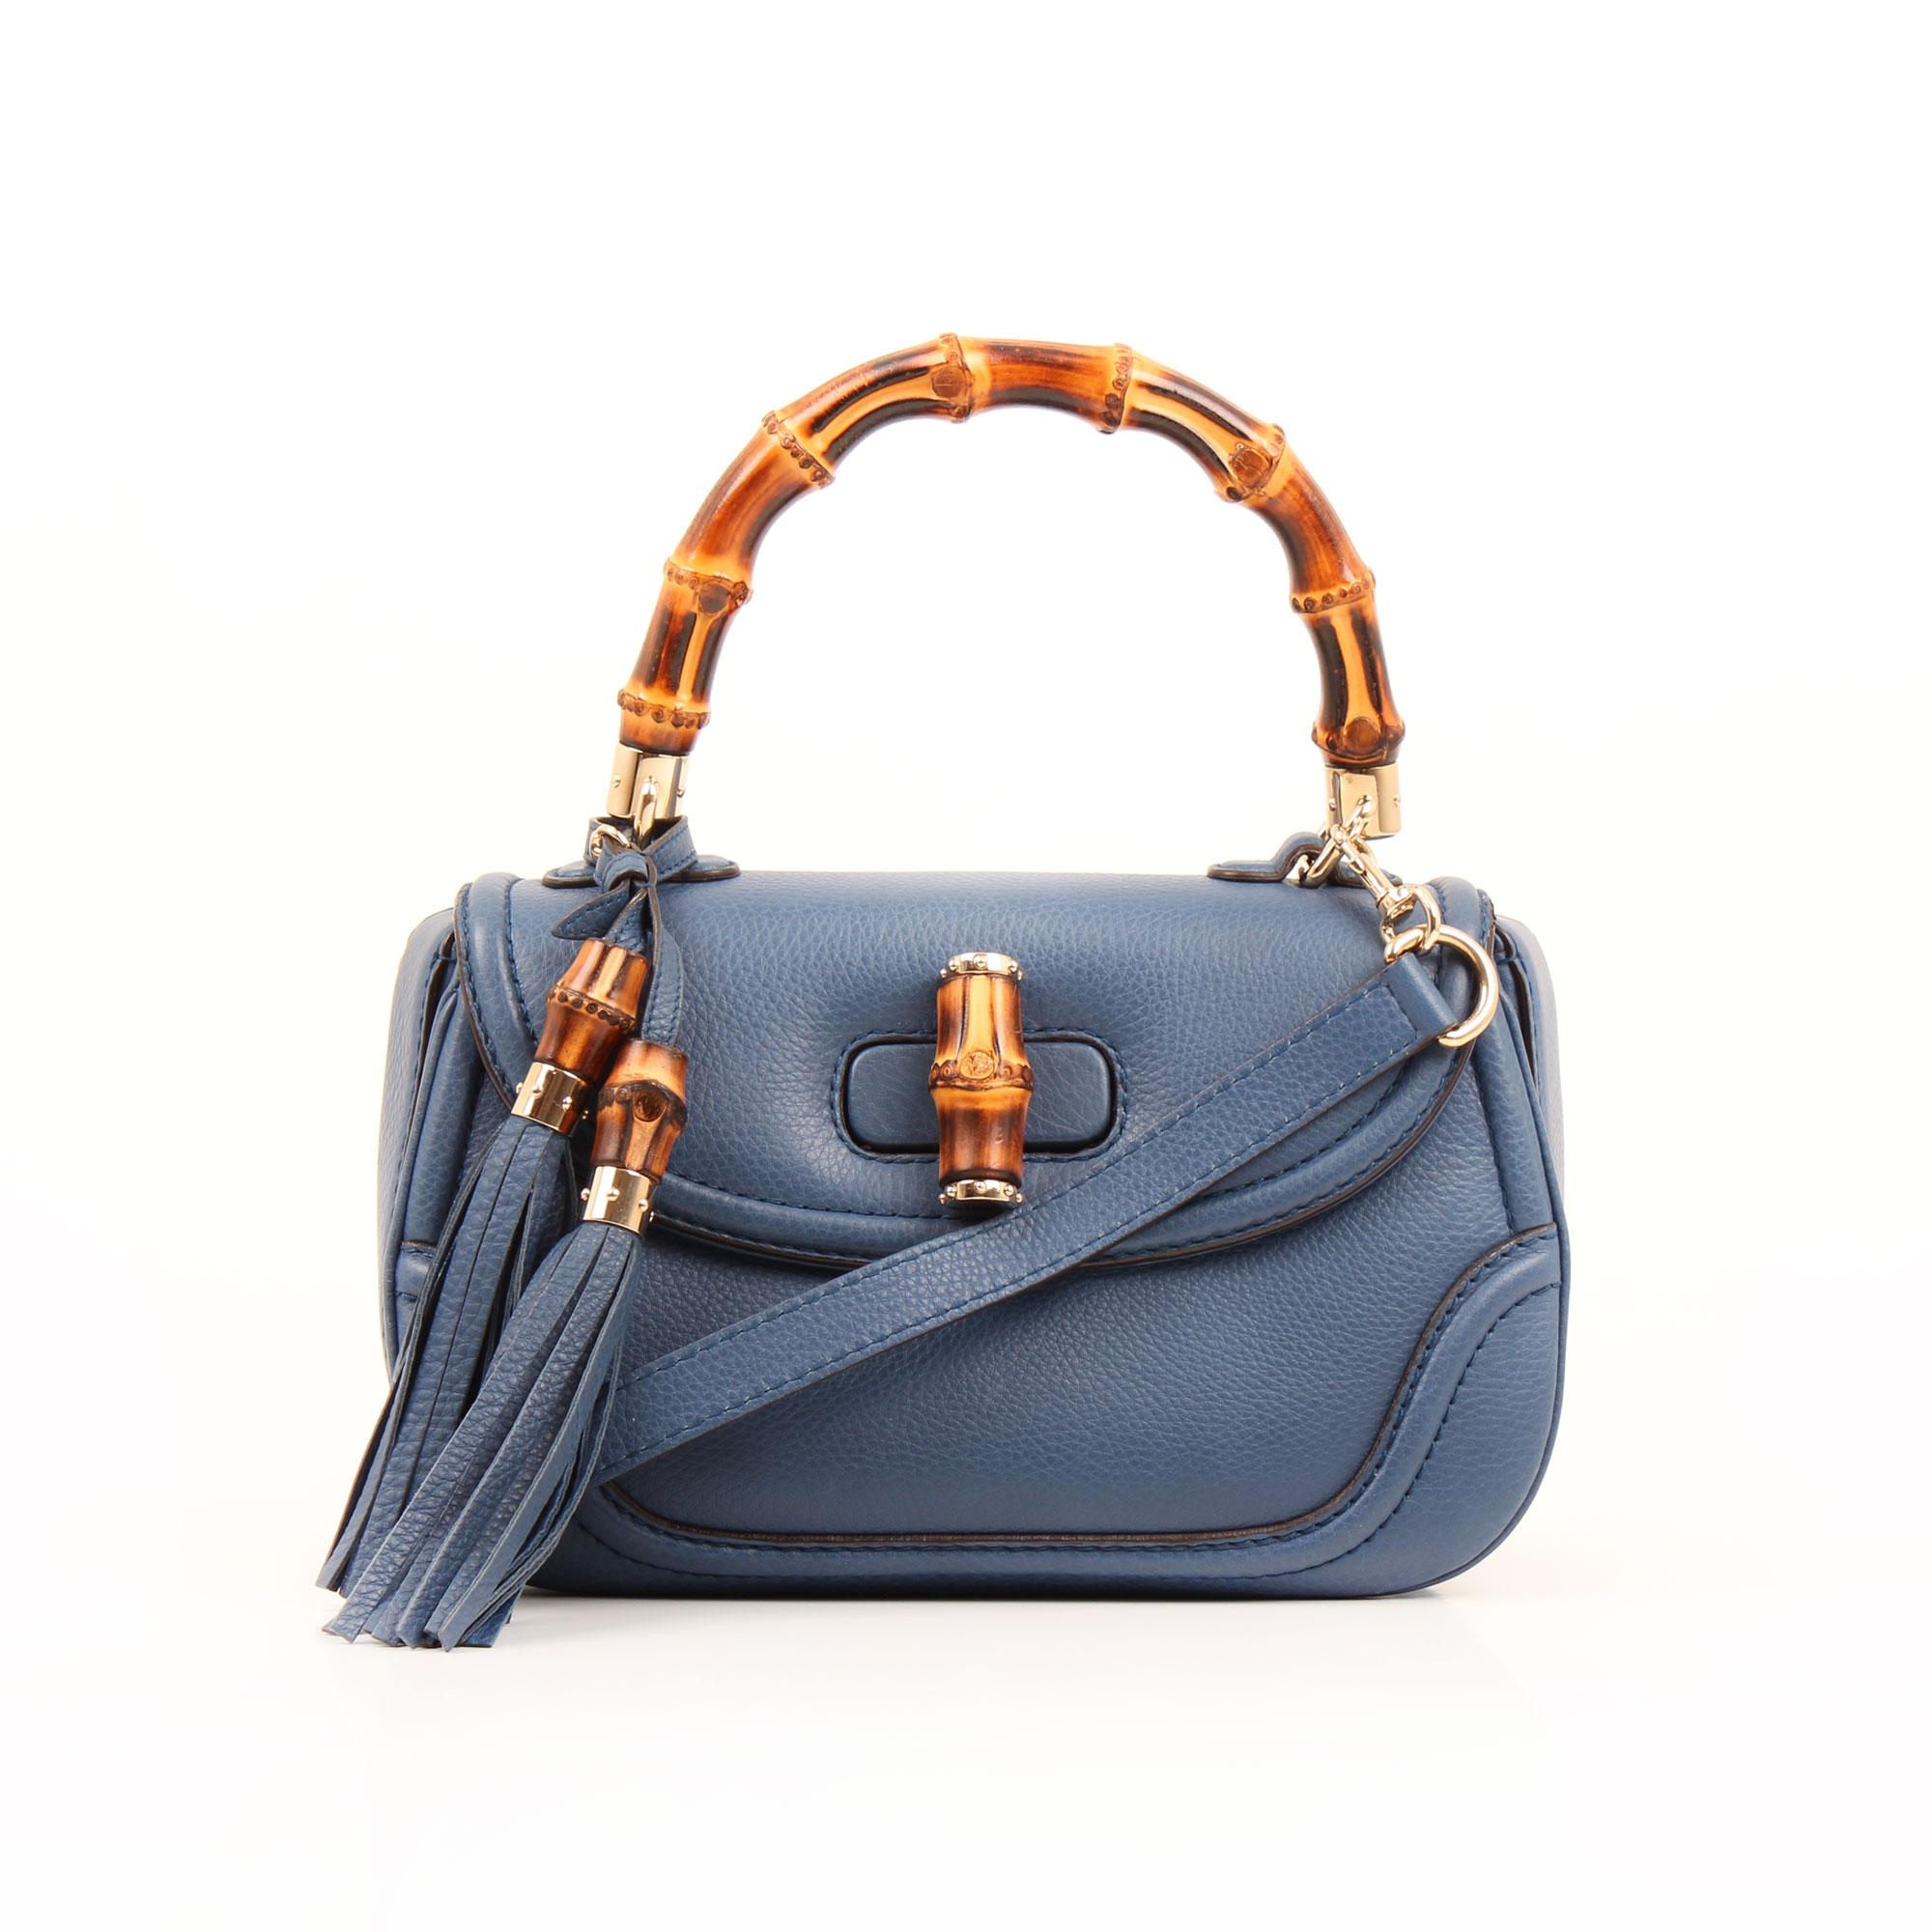 Imagen frontal del bolso gucci new bamboo mediano azul